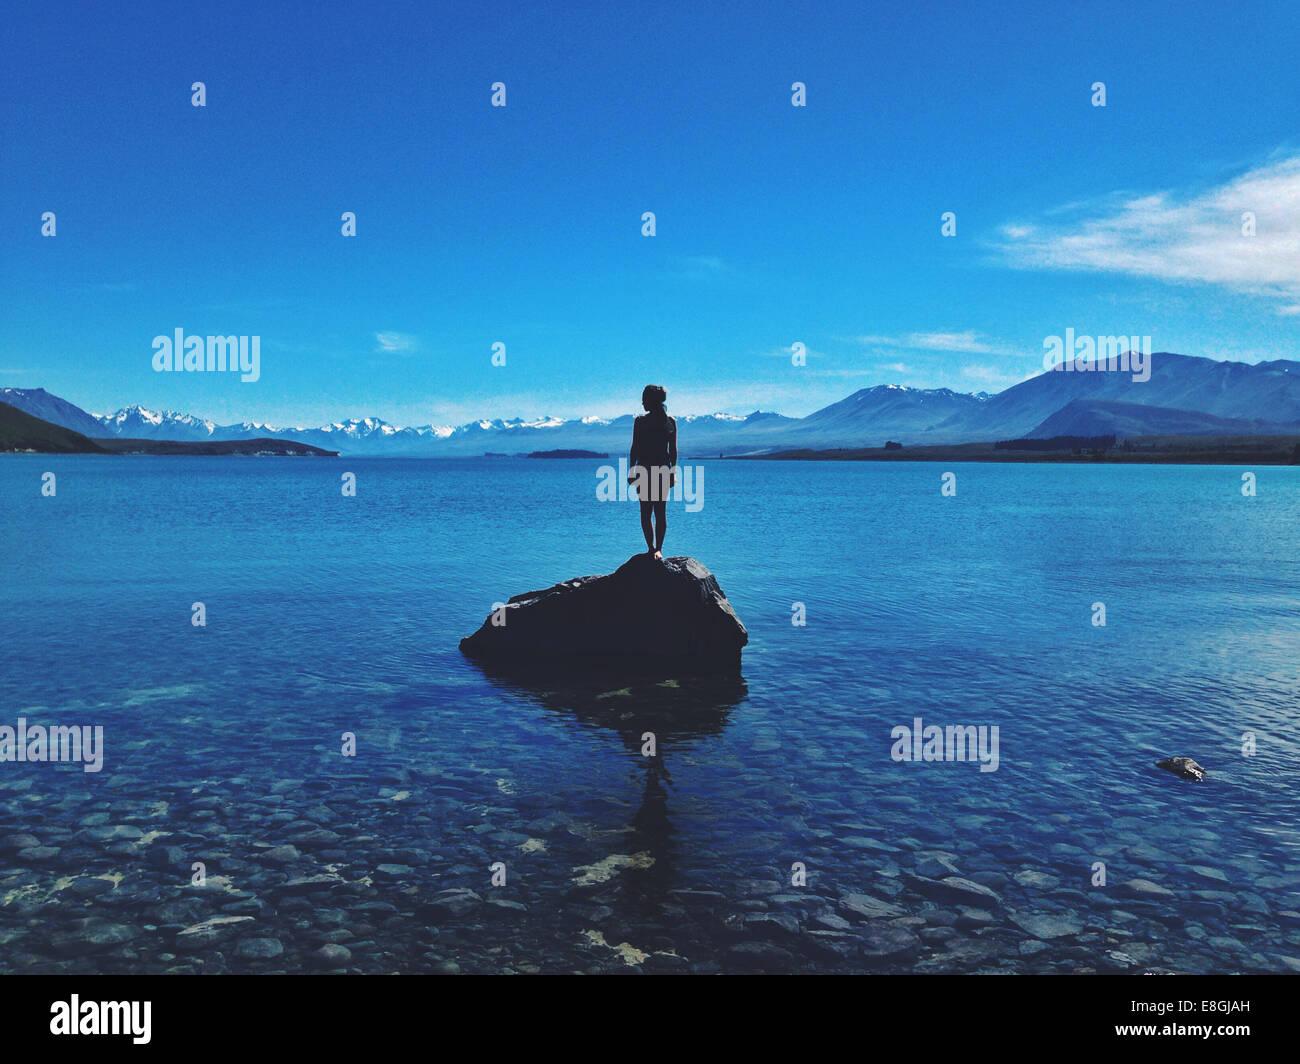 Frau steht auf einem Felsen, Lake Tekapo, Canterbury, Neuseeland Stockbild